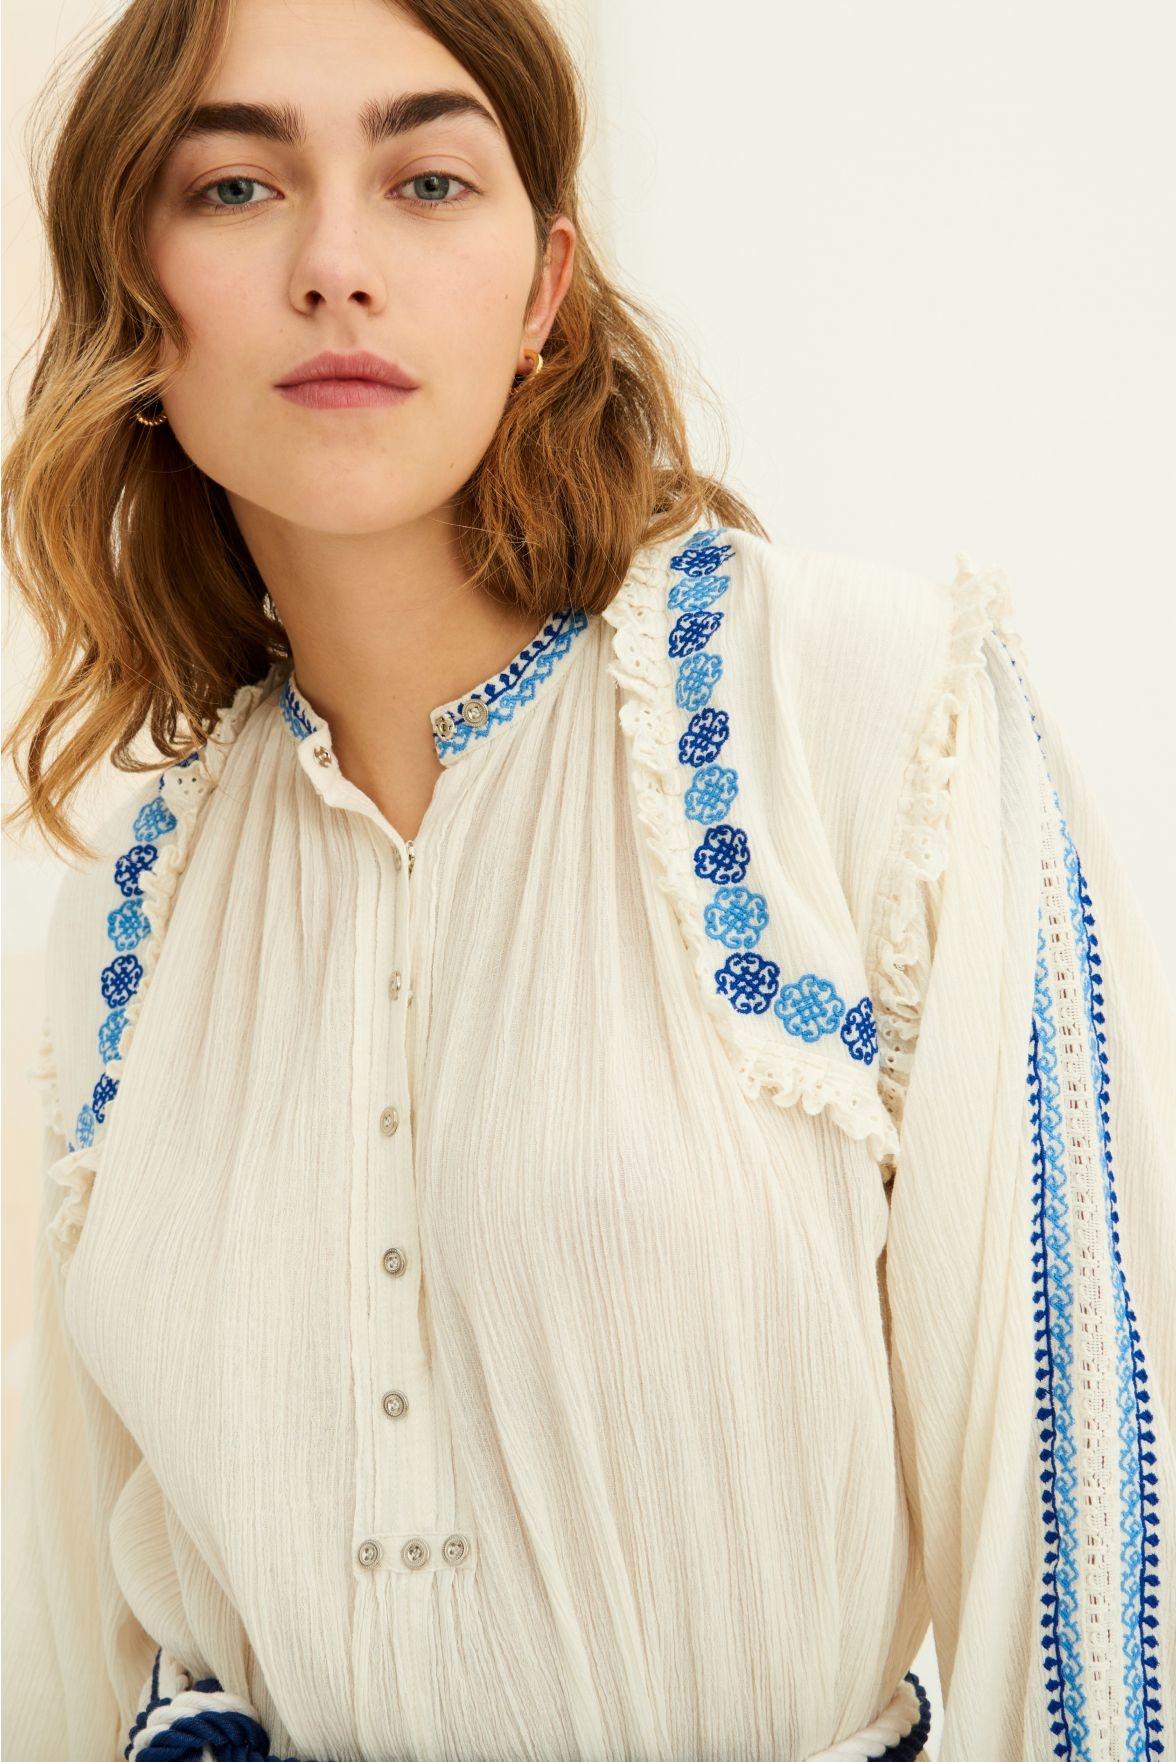 Pietro embroidered Dress white-4